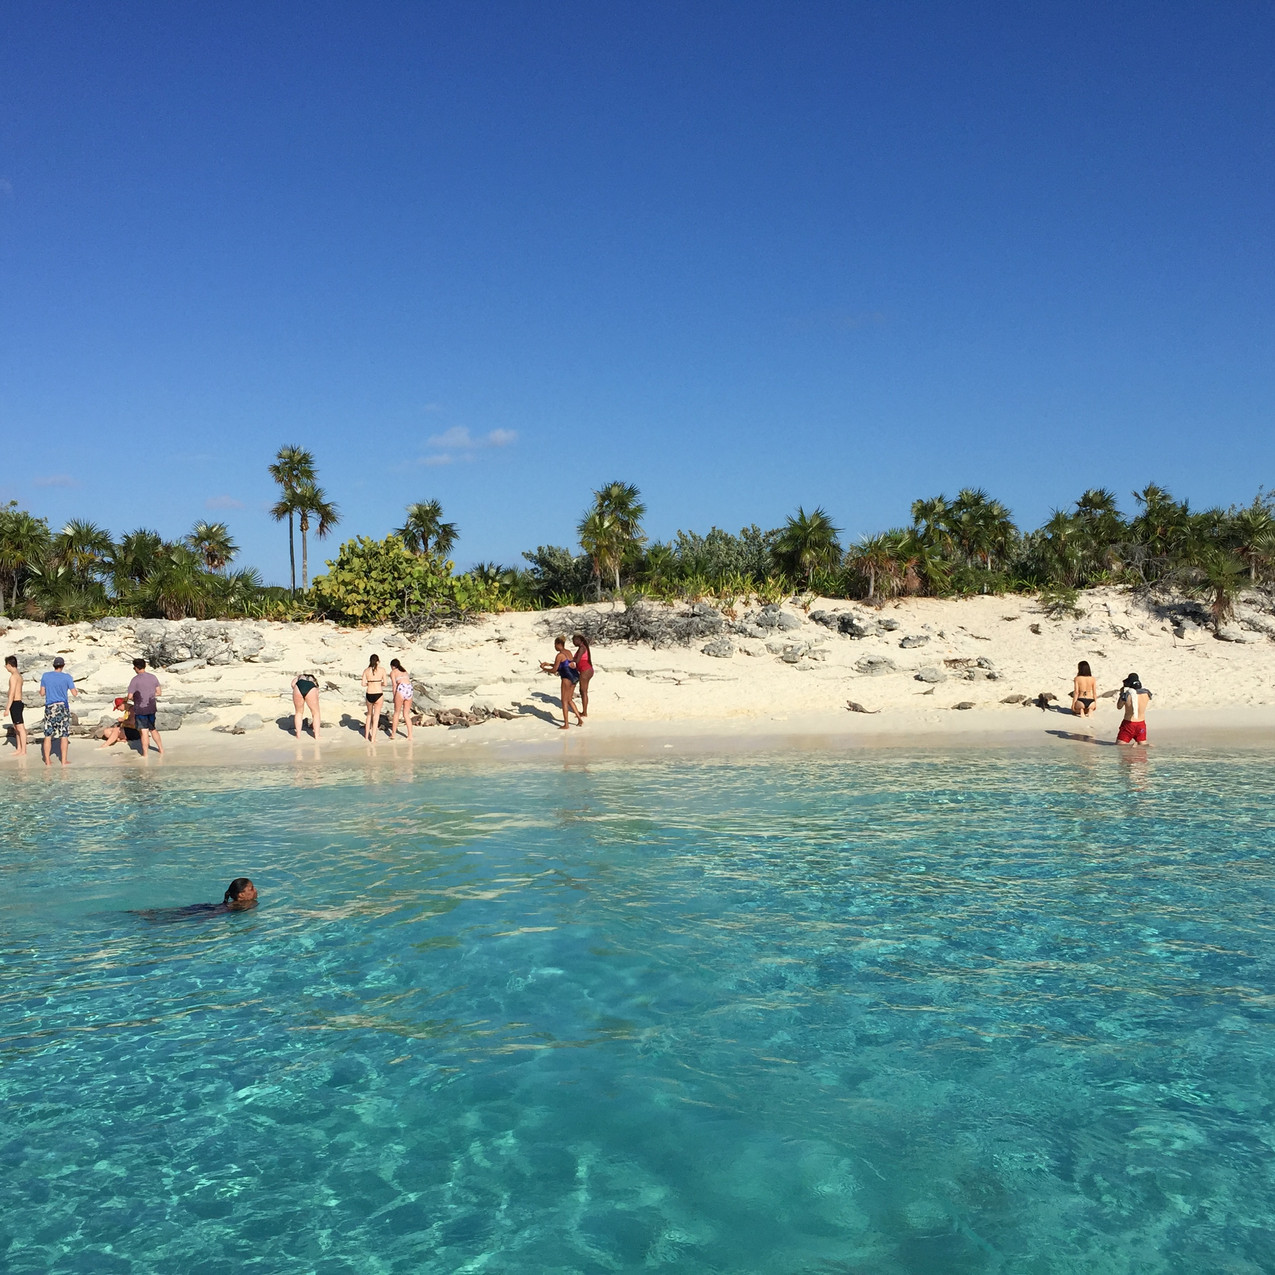 Bahamas, Exuma, Allen Cay